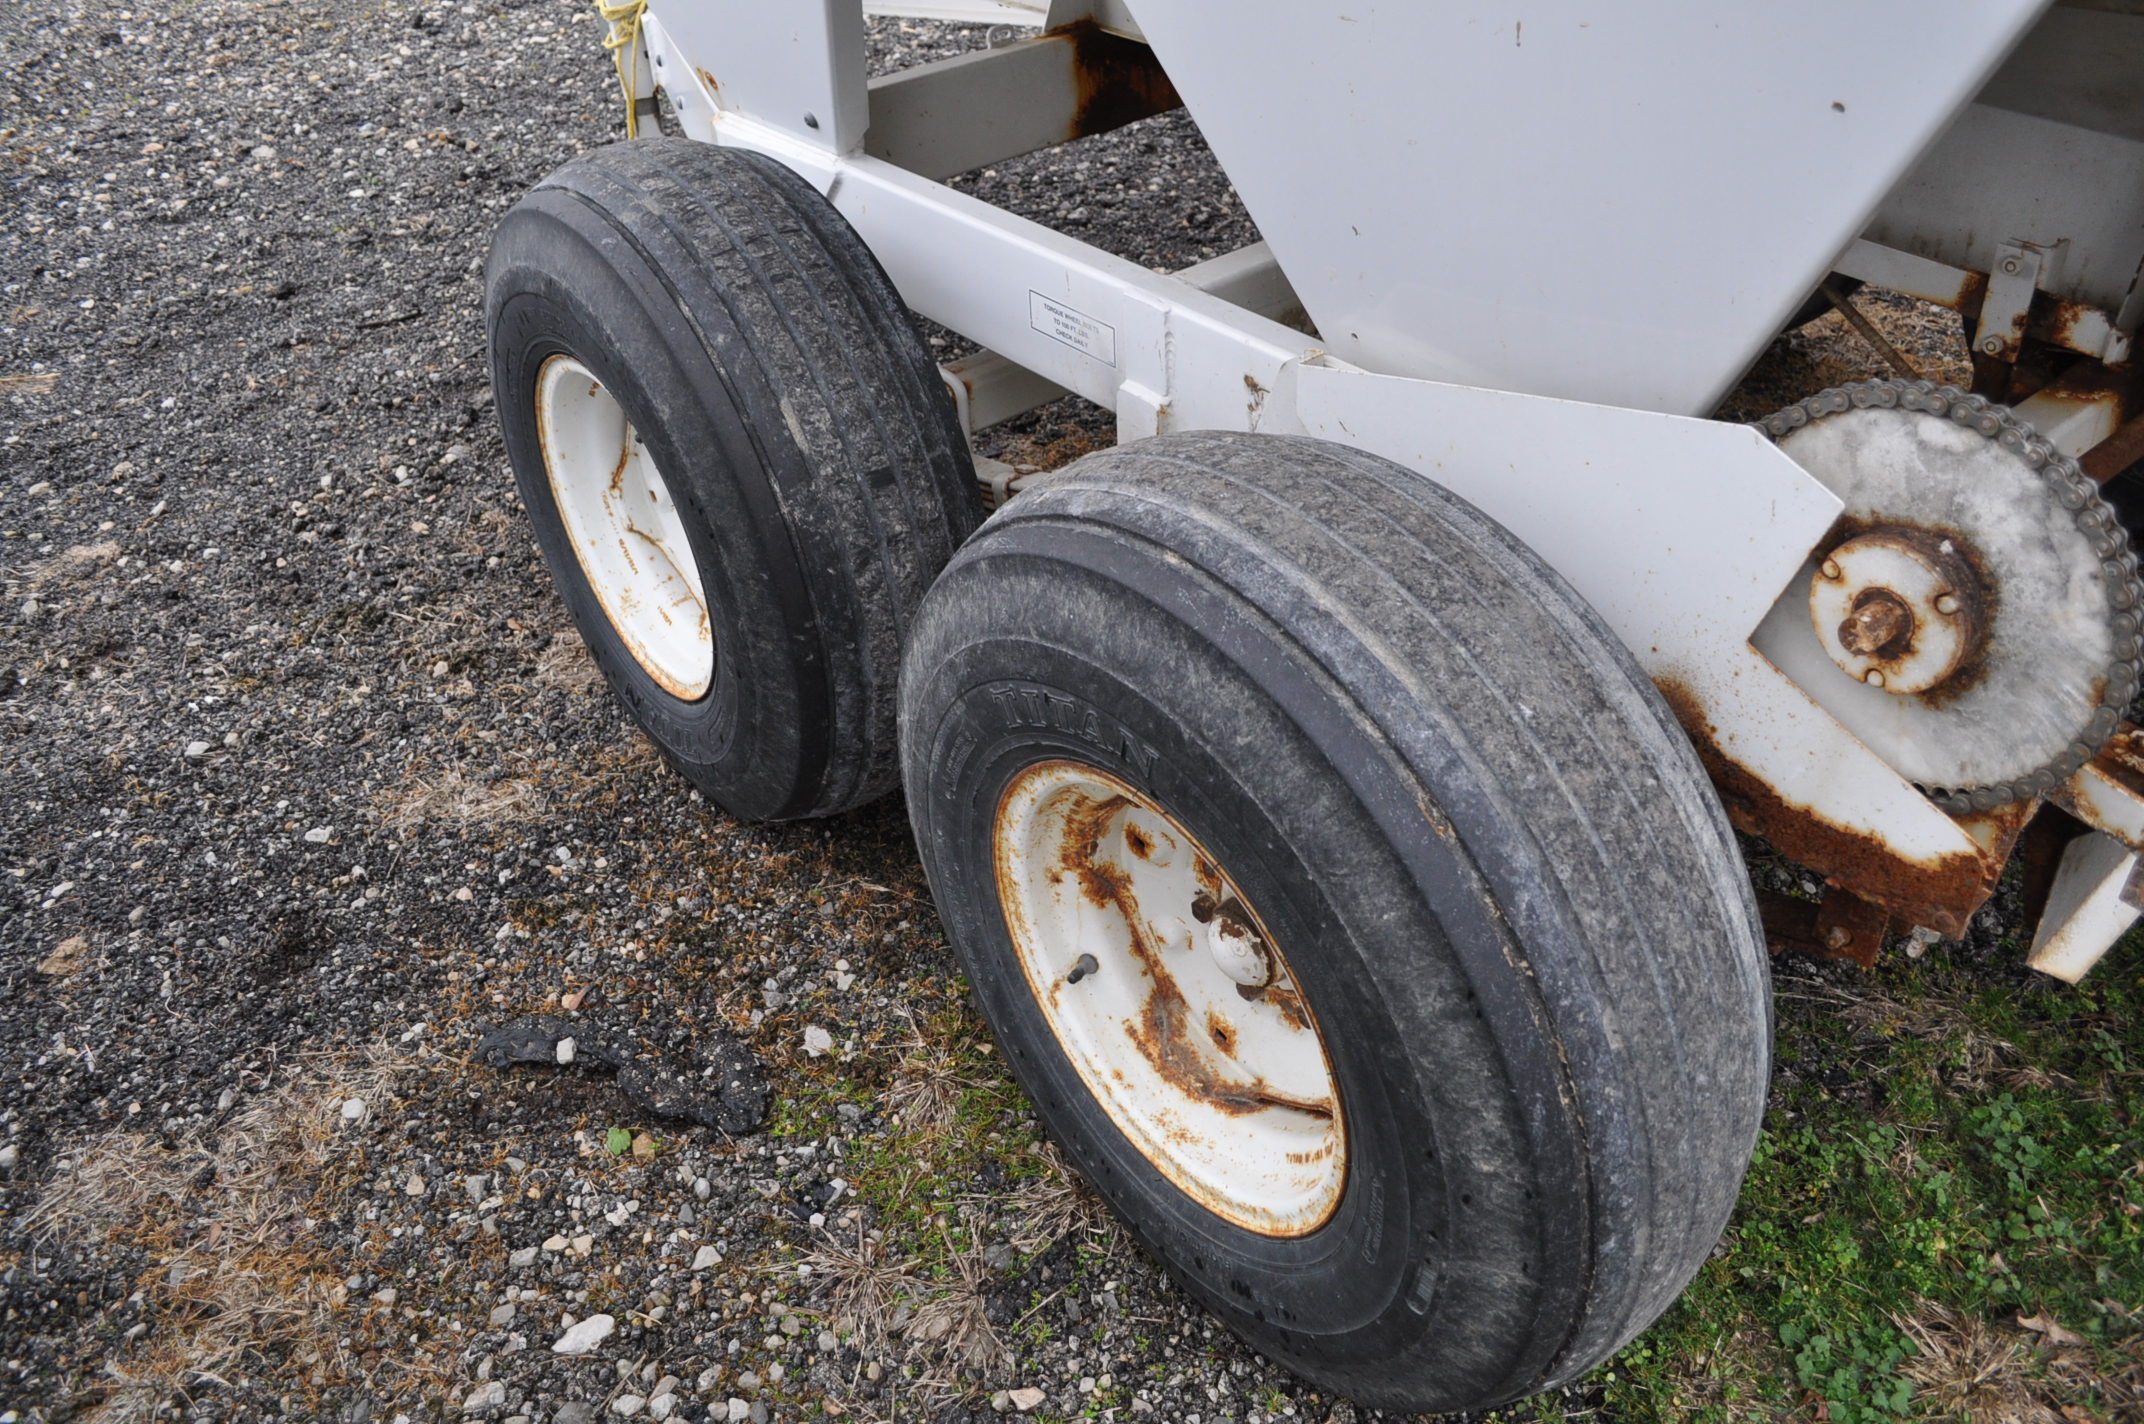 Wilmar Super 500 dry fertilizer spreaders, tandem axles, 12.5L-15 tires, twin spreaders, 540 pto - Image 10 of 12